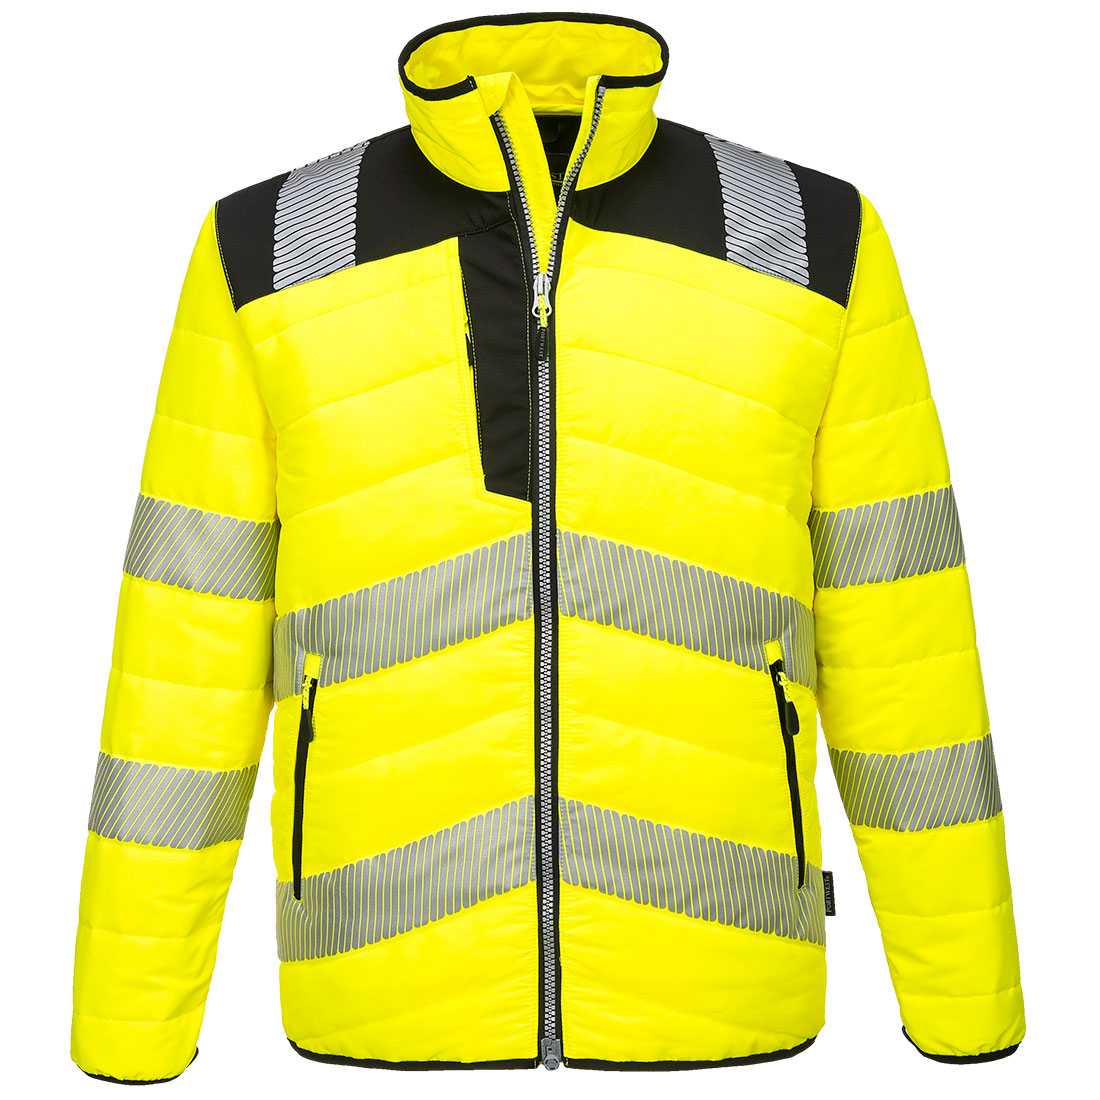 PW3 Hi-Vis Baffle Jacket